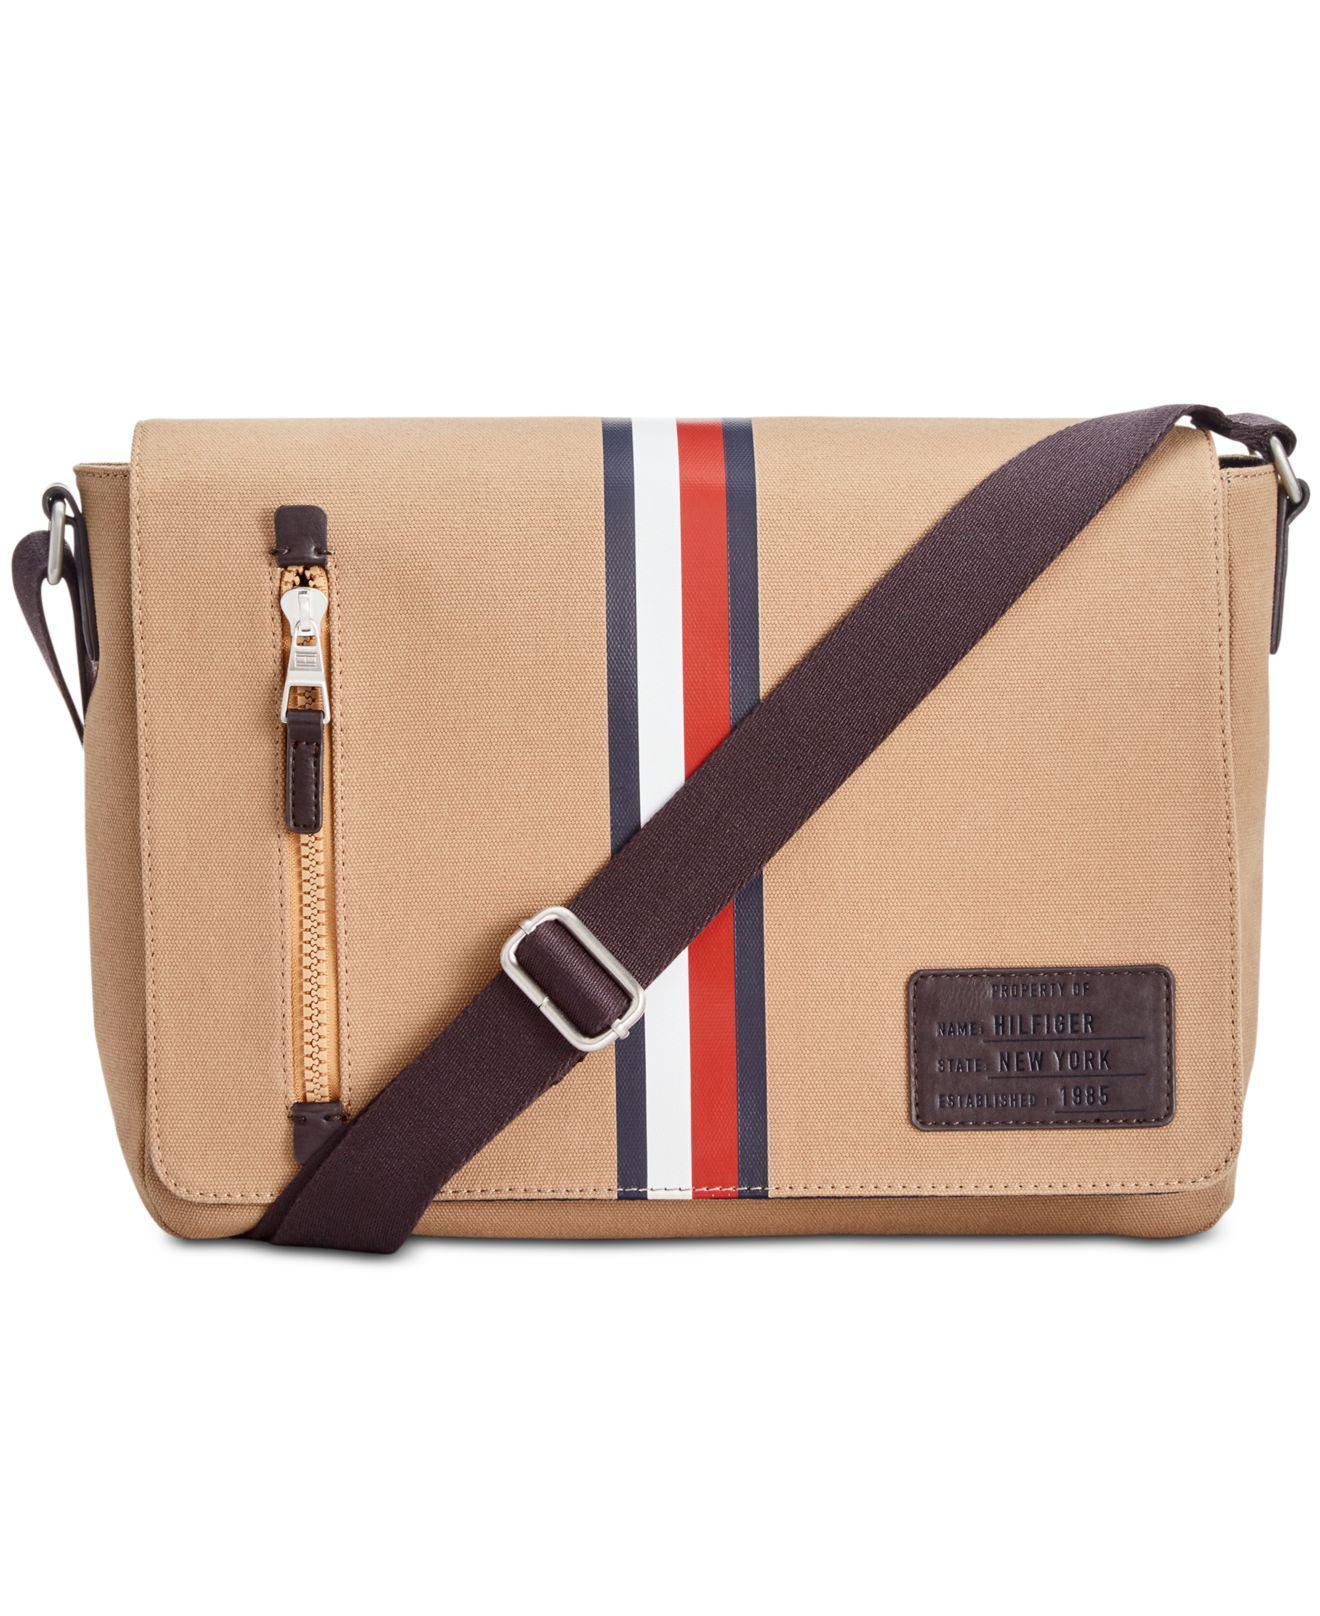 b3e2a2c1a7 Tommy Hilfiger Harrison Messenger Bag for Men - Lyst